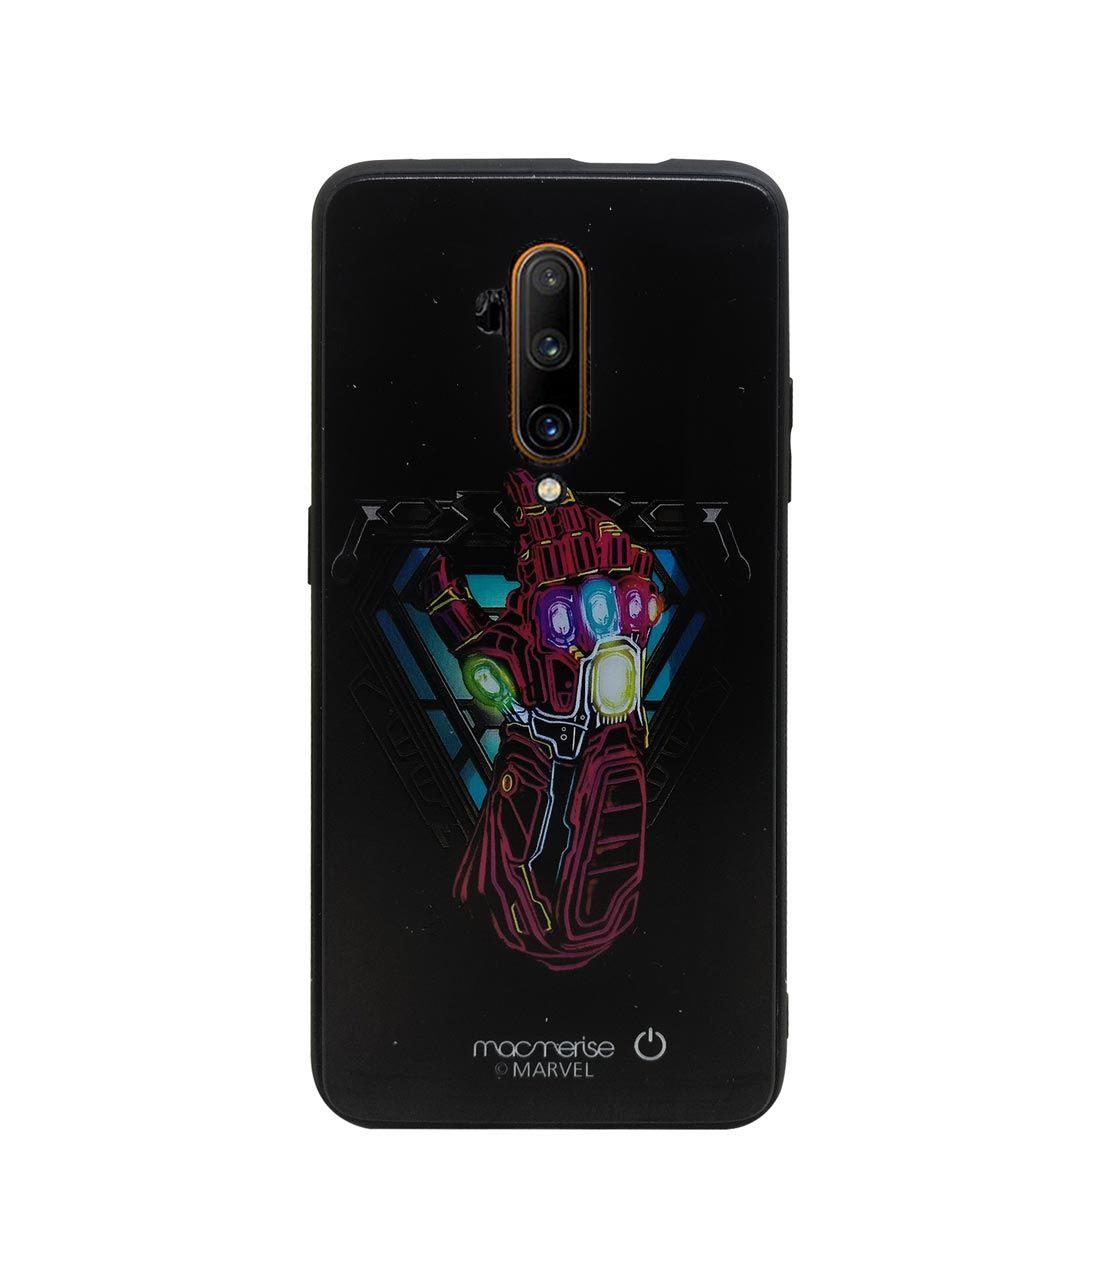 Nano Gauntlet - Lumous LED Phone Case for OnePlus 7T Pro